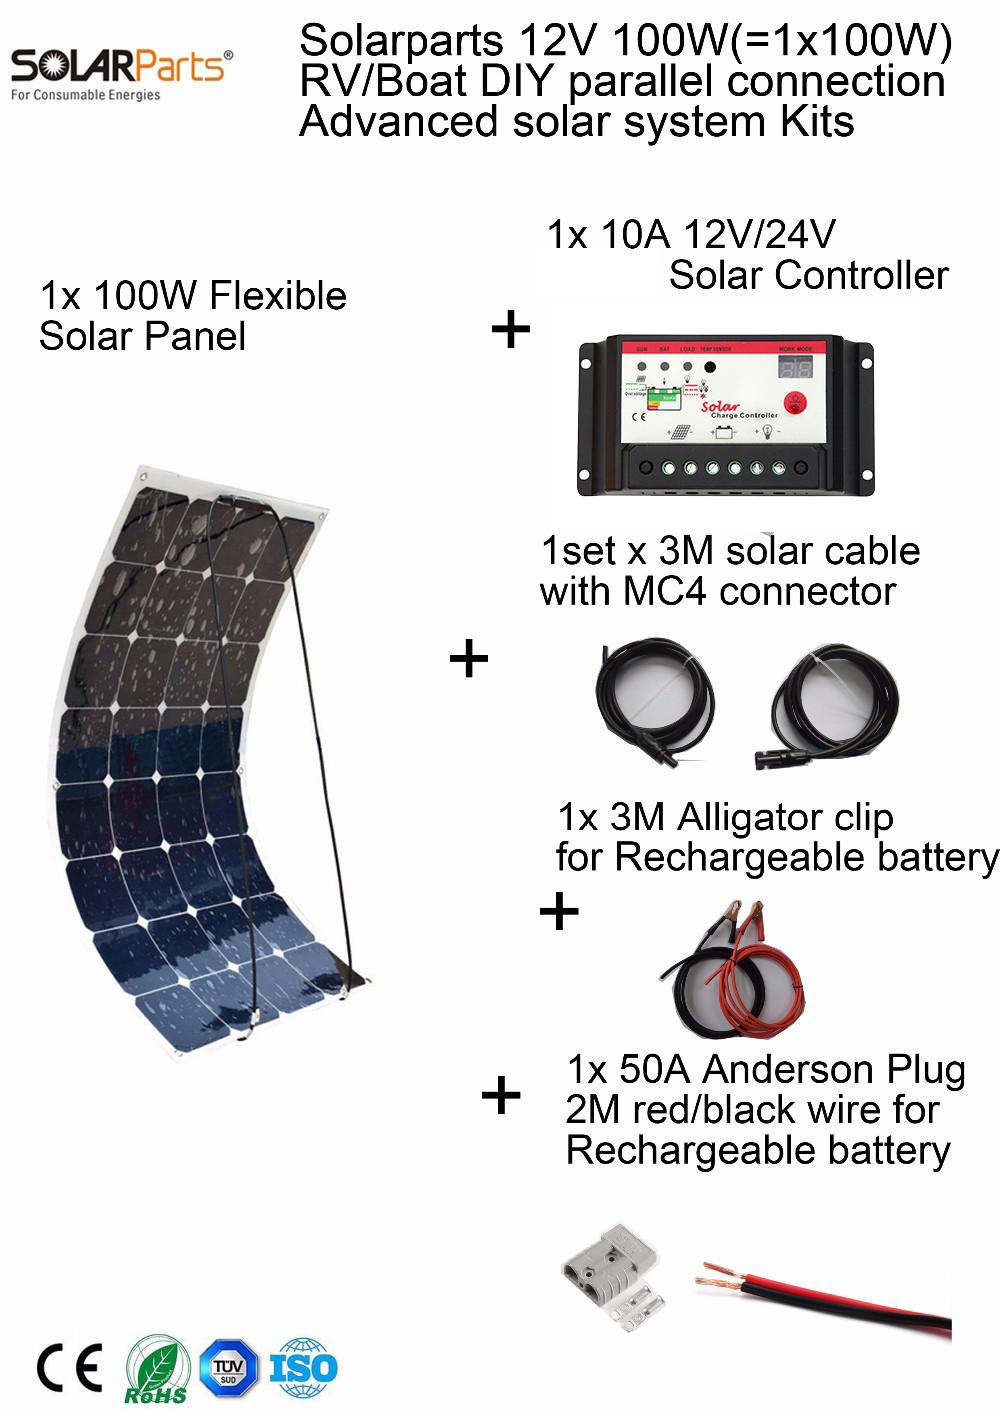 100w SOLAR SYSTEM